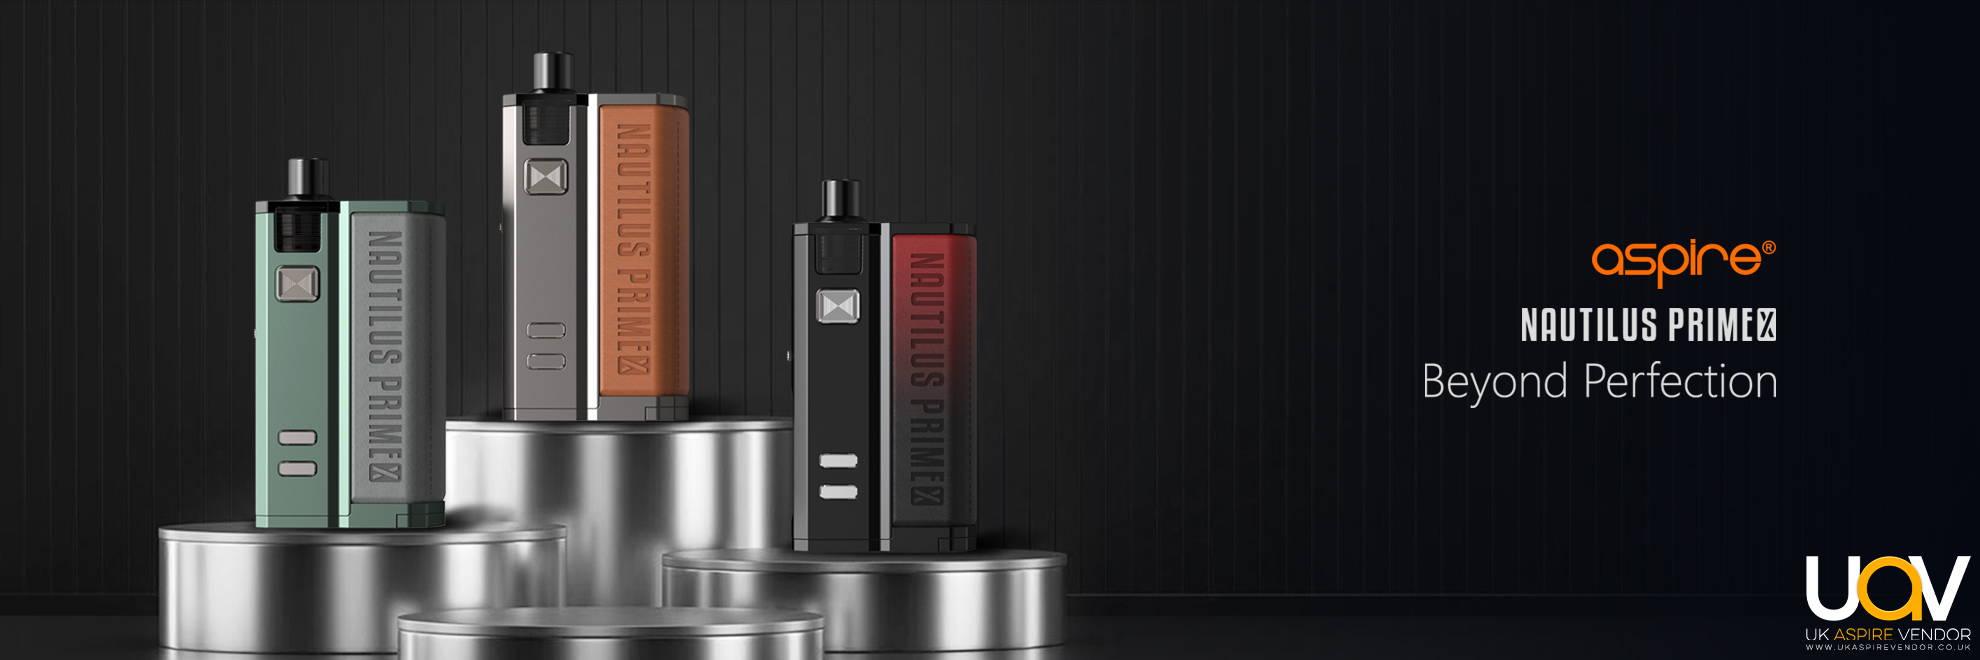 Nautilus Prime X | Aspire Pod Devices | Buy Aspire Vape Pods Online